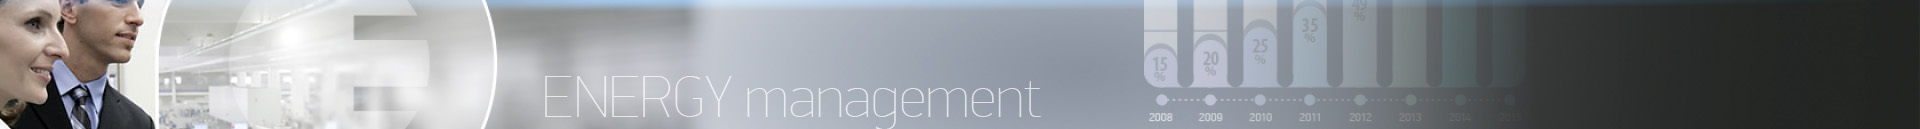 energien_managment_new